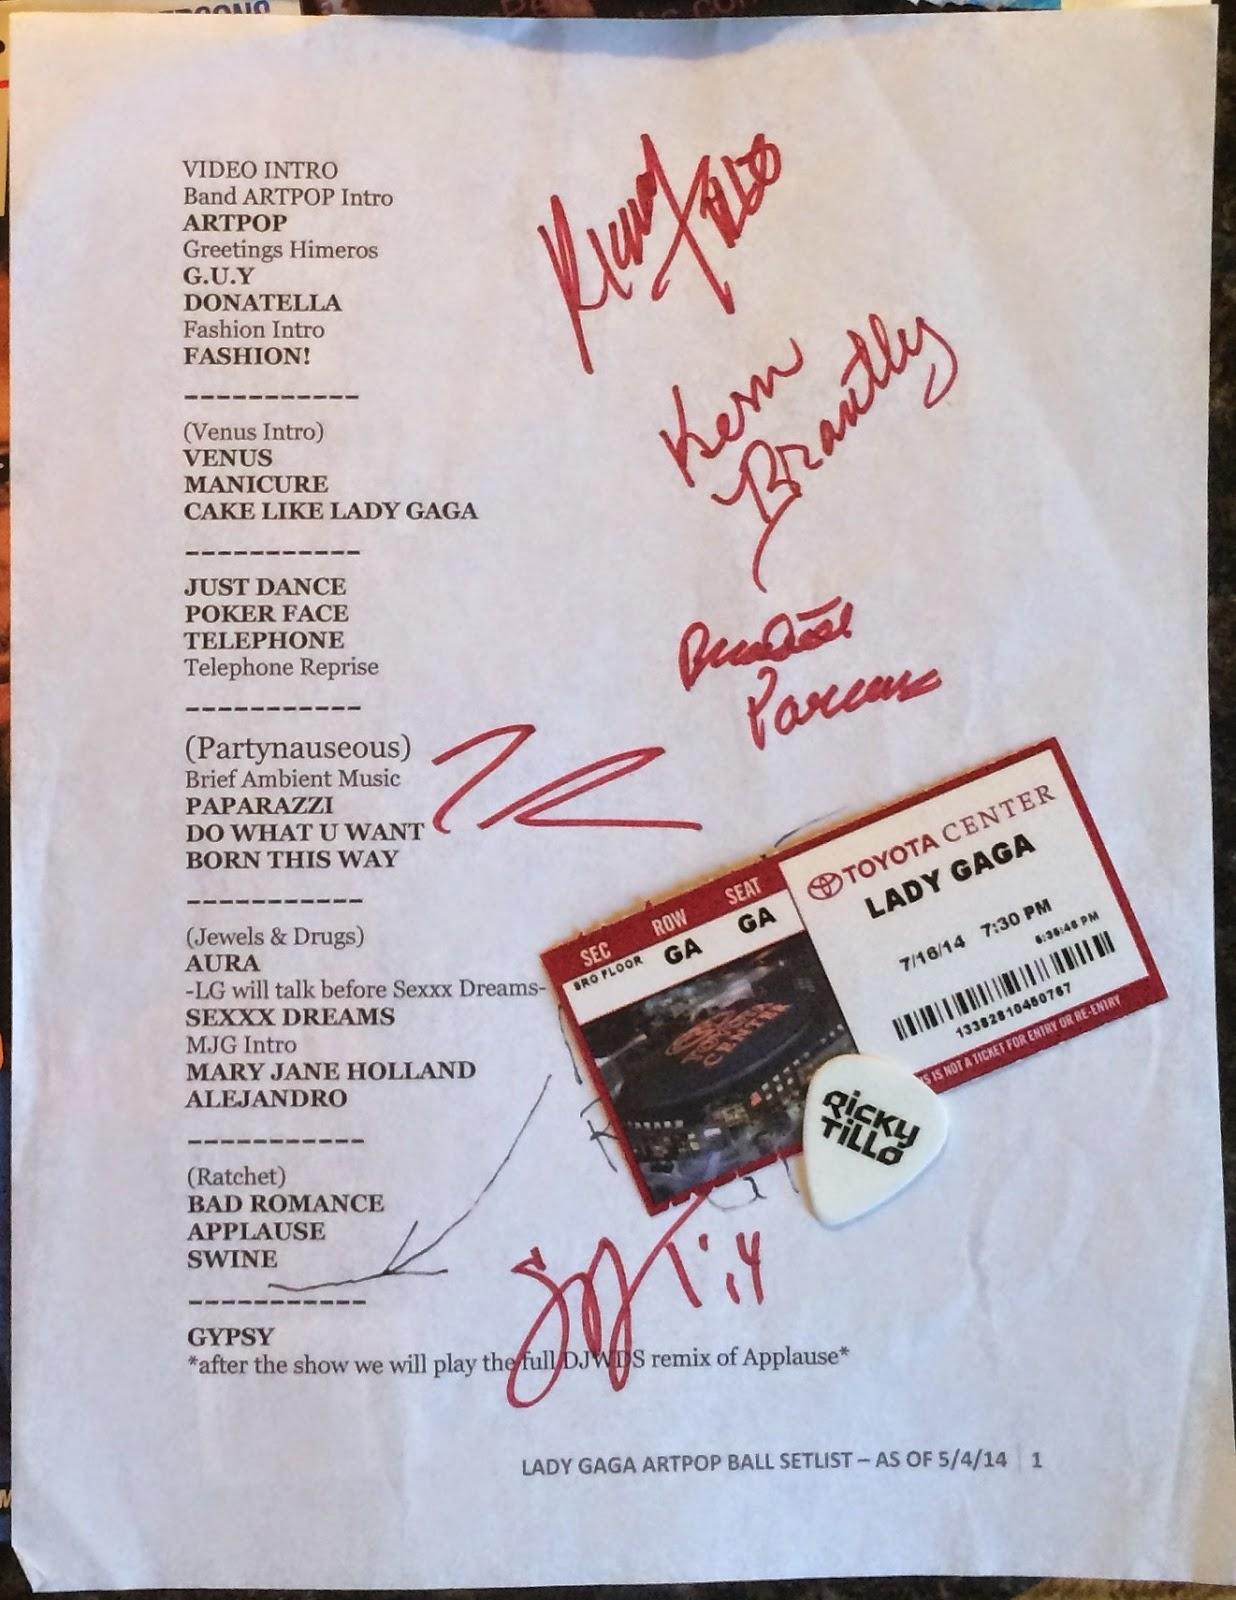 The coloring book tour setlist - Signed Artrave Setlist